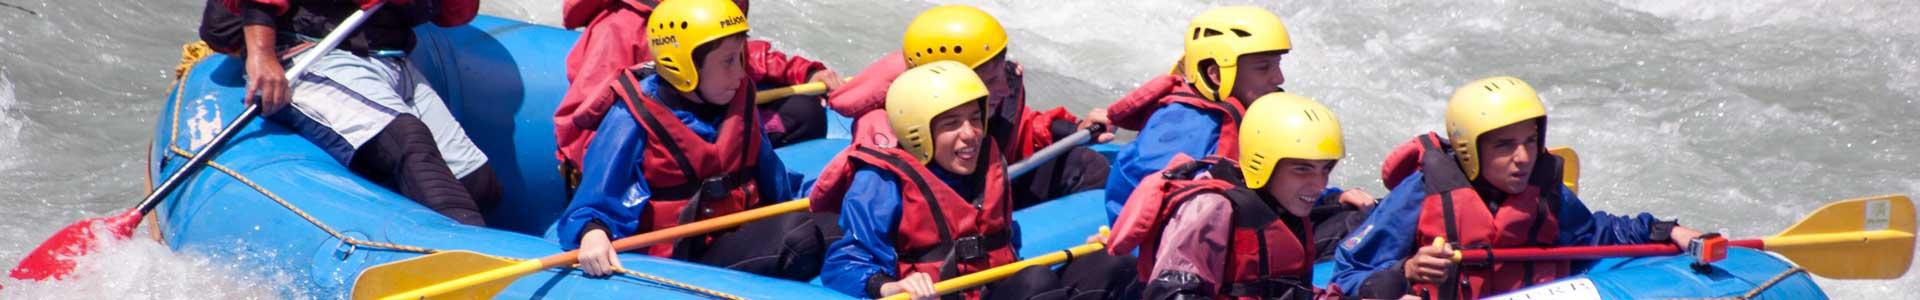 rafting bambini